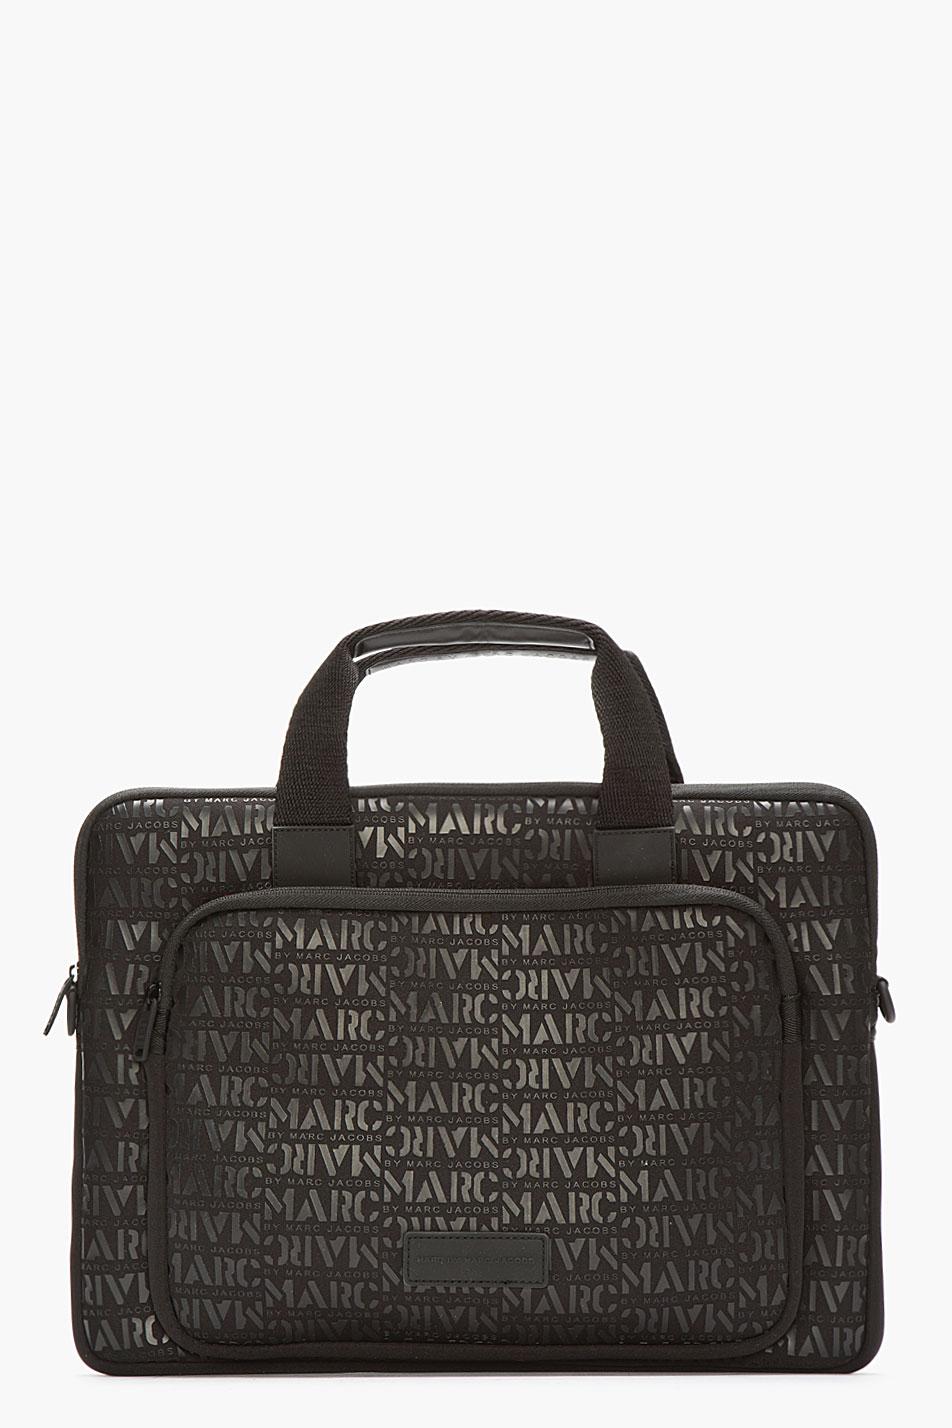 marc by marc jacobs black neoprene logomania 15 laptop commuter bag in black for men lyst. Black Bedroom Furniture Sets. Home Design Ideas